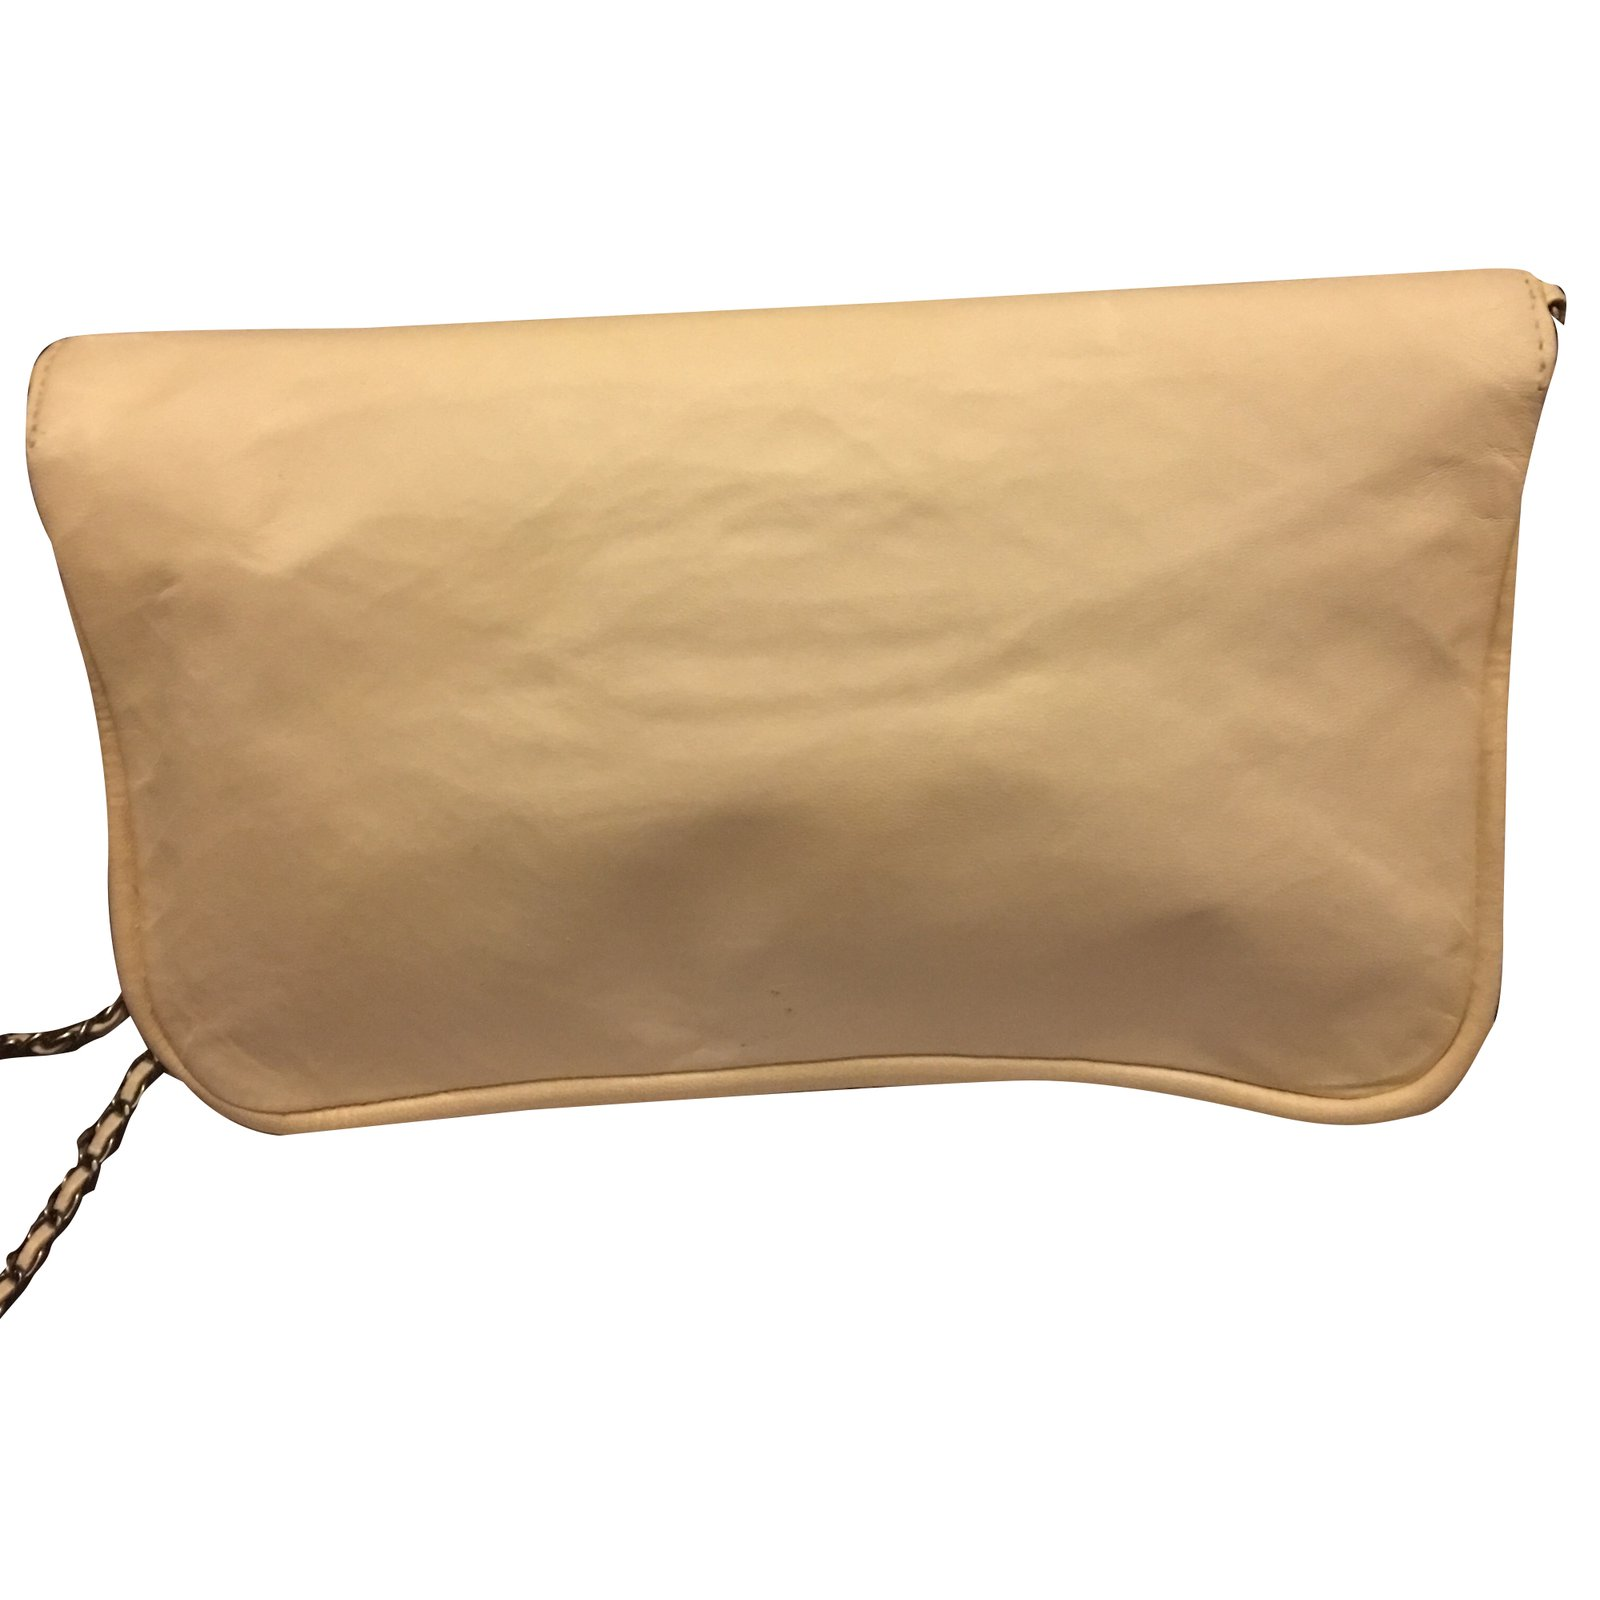 fd727587752b Chanel Reissue Wallet on Chain Handbags Leather Cream ref.29053 - Joli  Closet